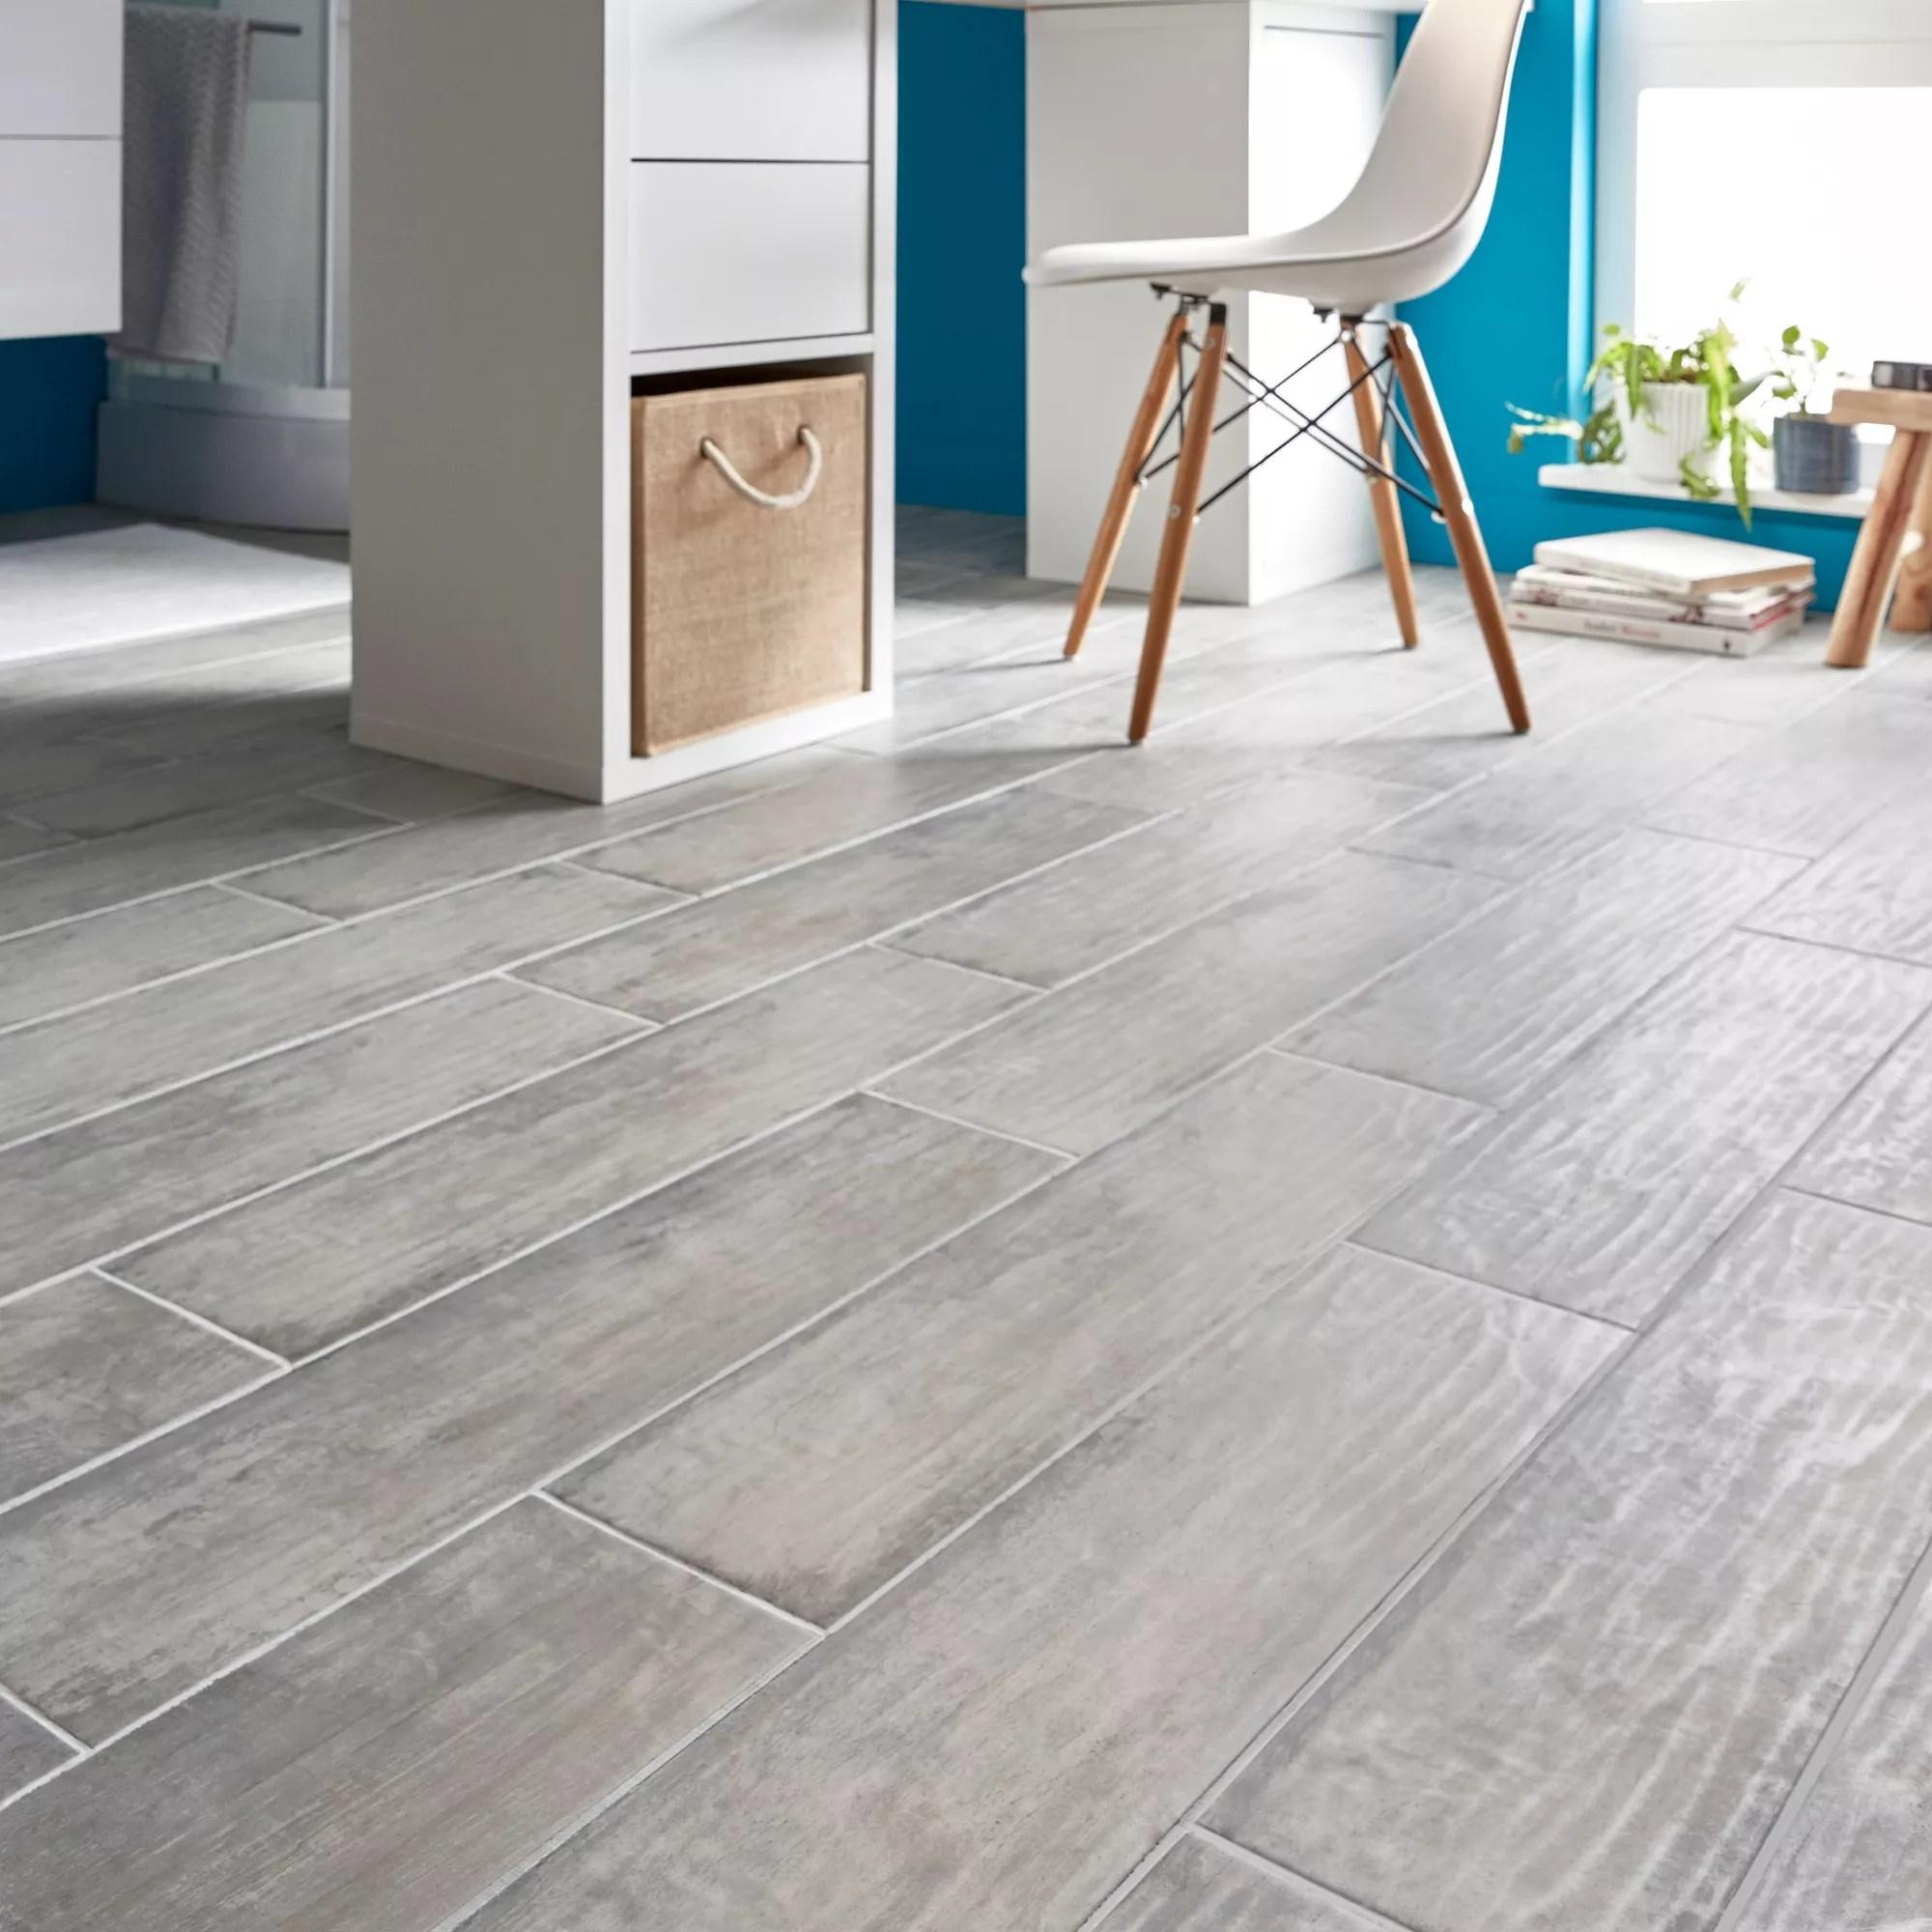 soft patinated grey matt wood effect porcelain floor tile pack of 11 l 600mm w 150mm